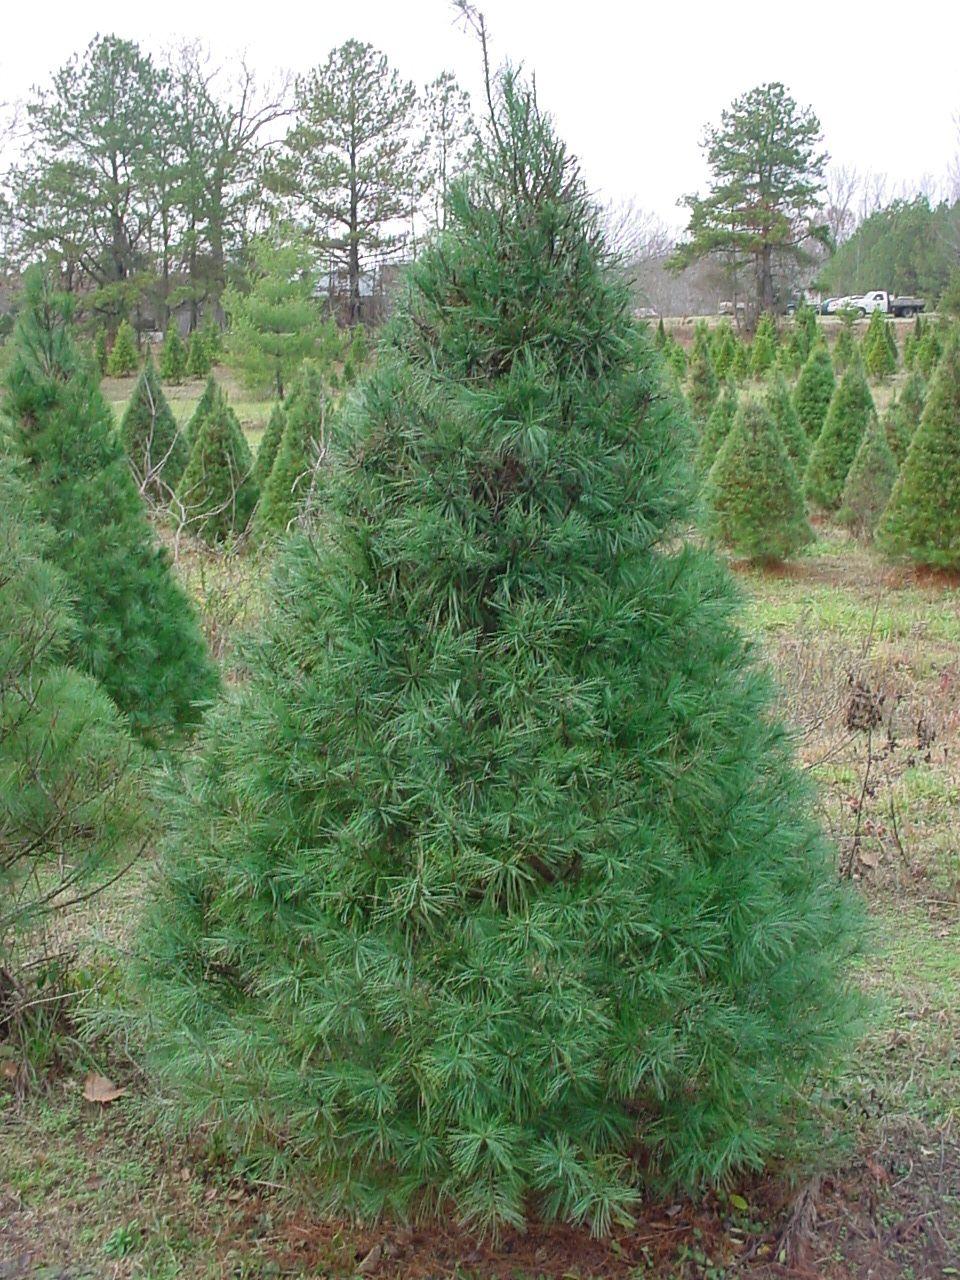 White Pine Trees For Your Garden Landscape Designs For Your Home White Pine Tree Garden Landscape Design Landscape Design